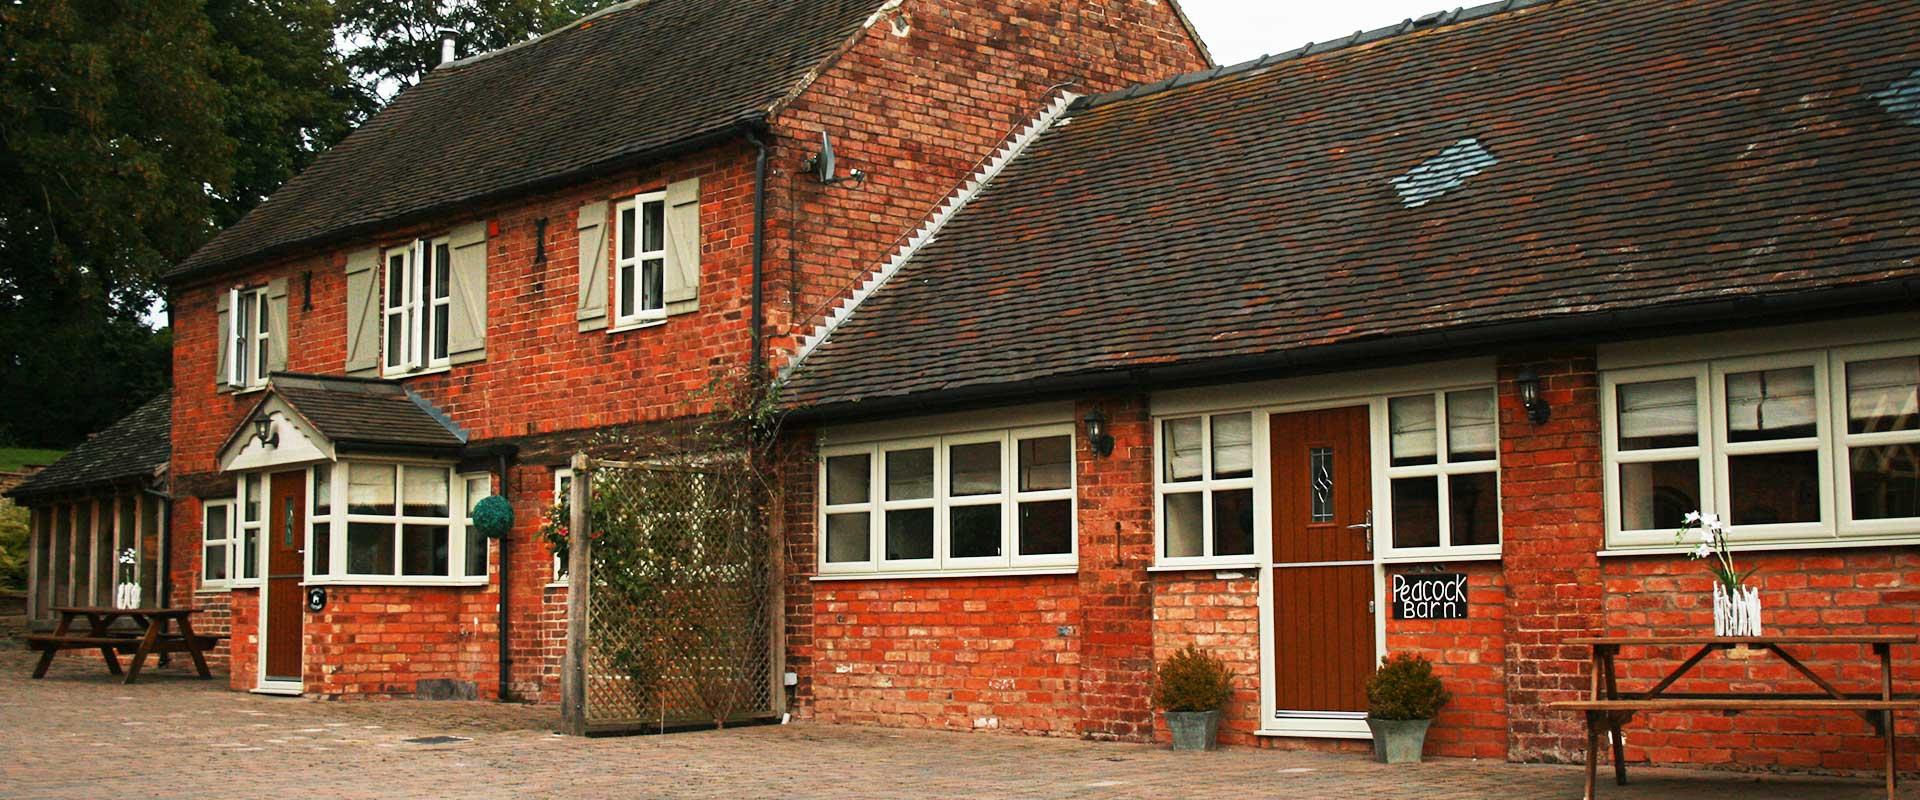 brankley-farm-cottages-2